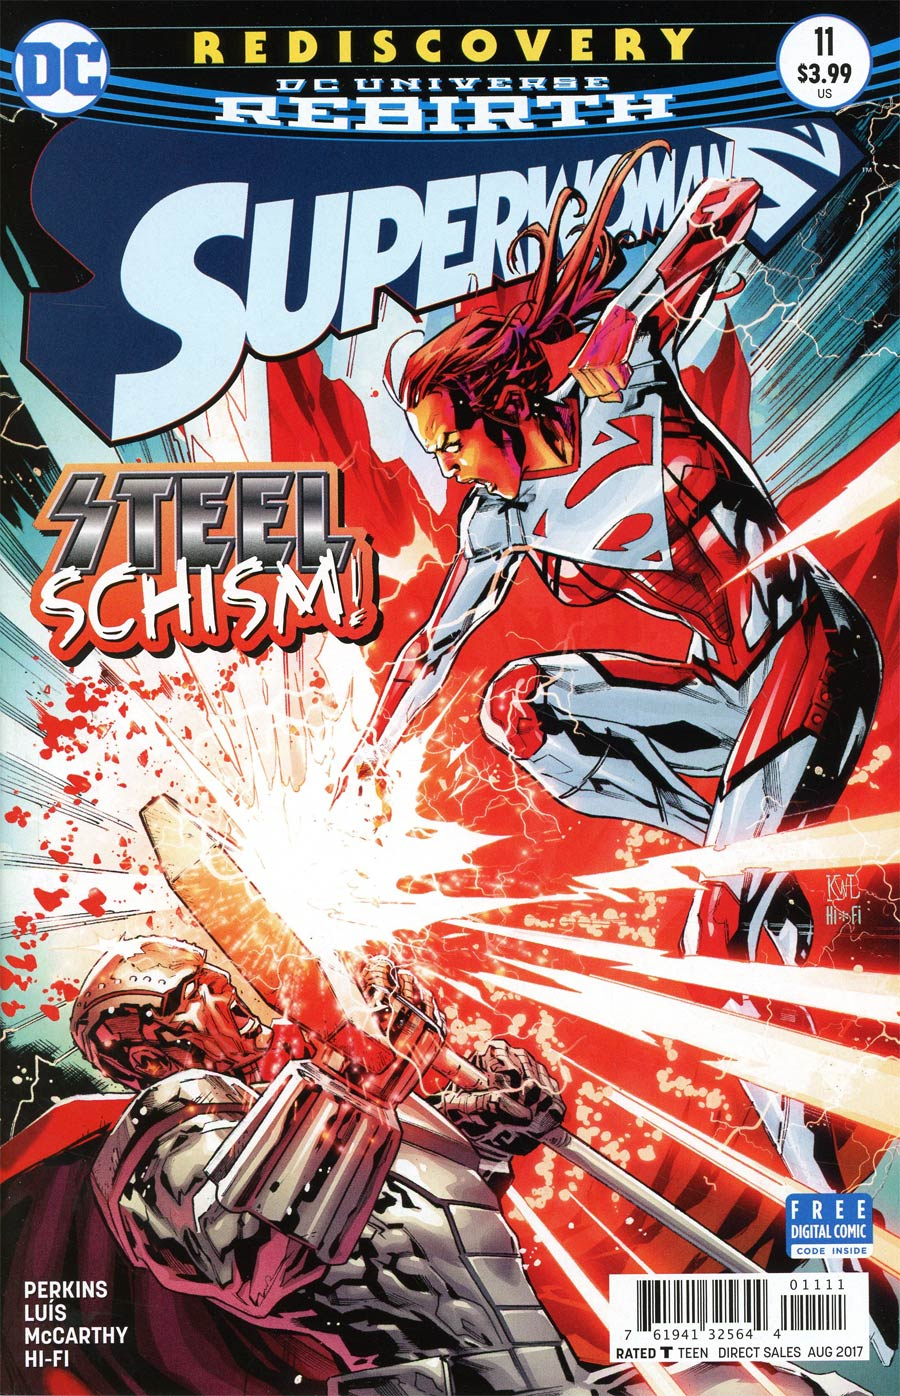 Superwoman #11 Cover A Regular Ken Lashley Cover